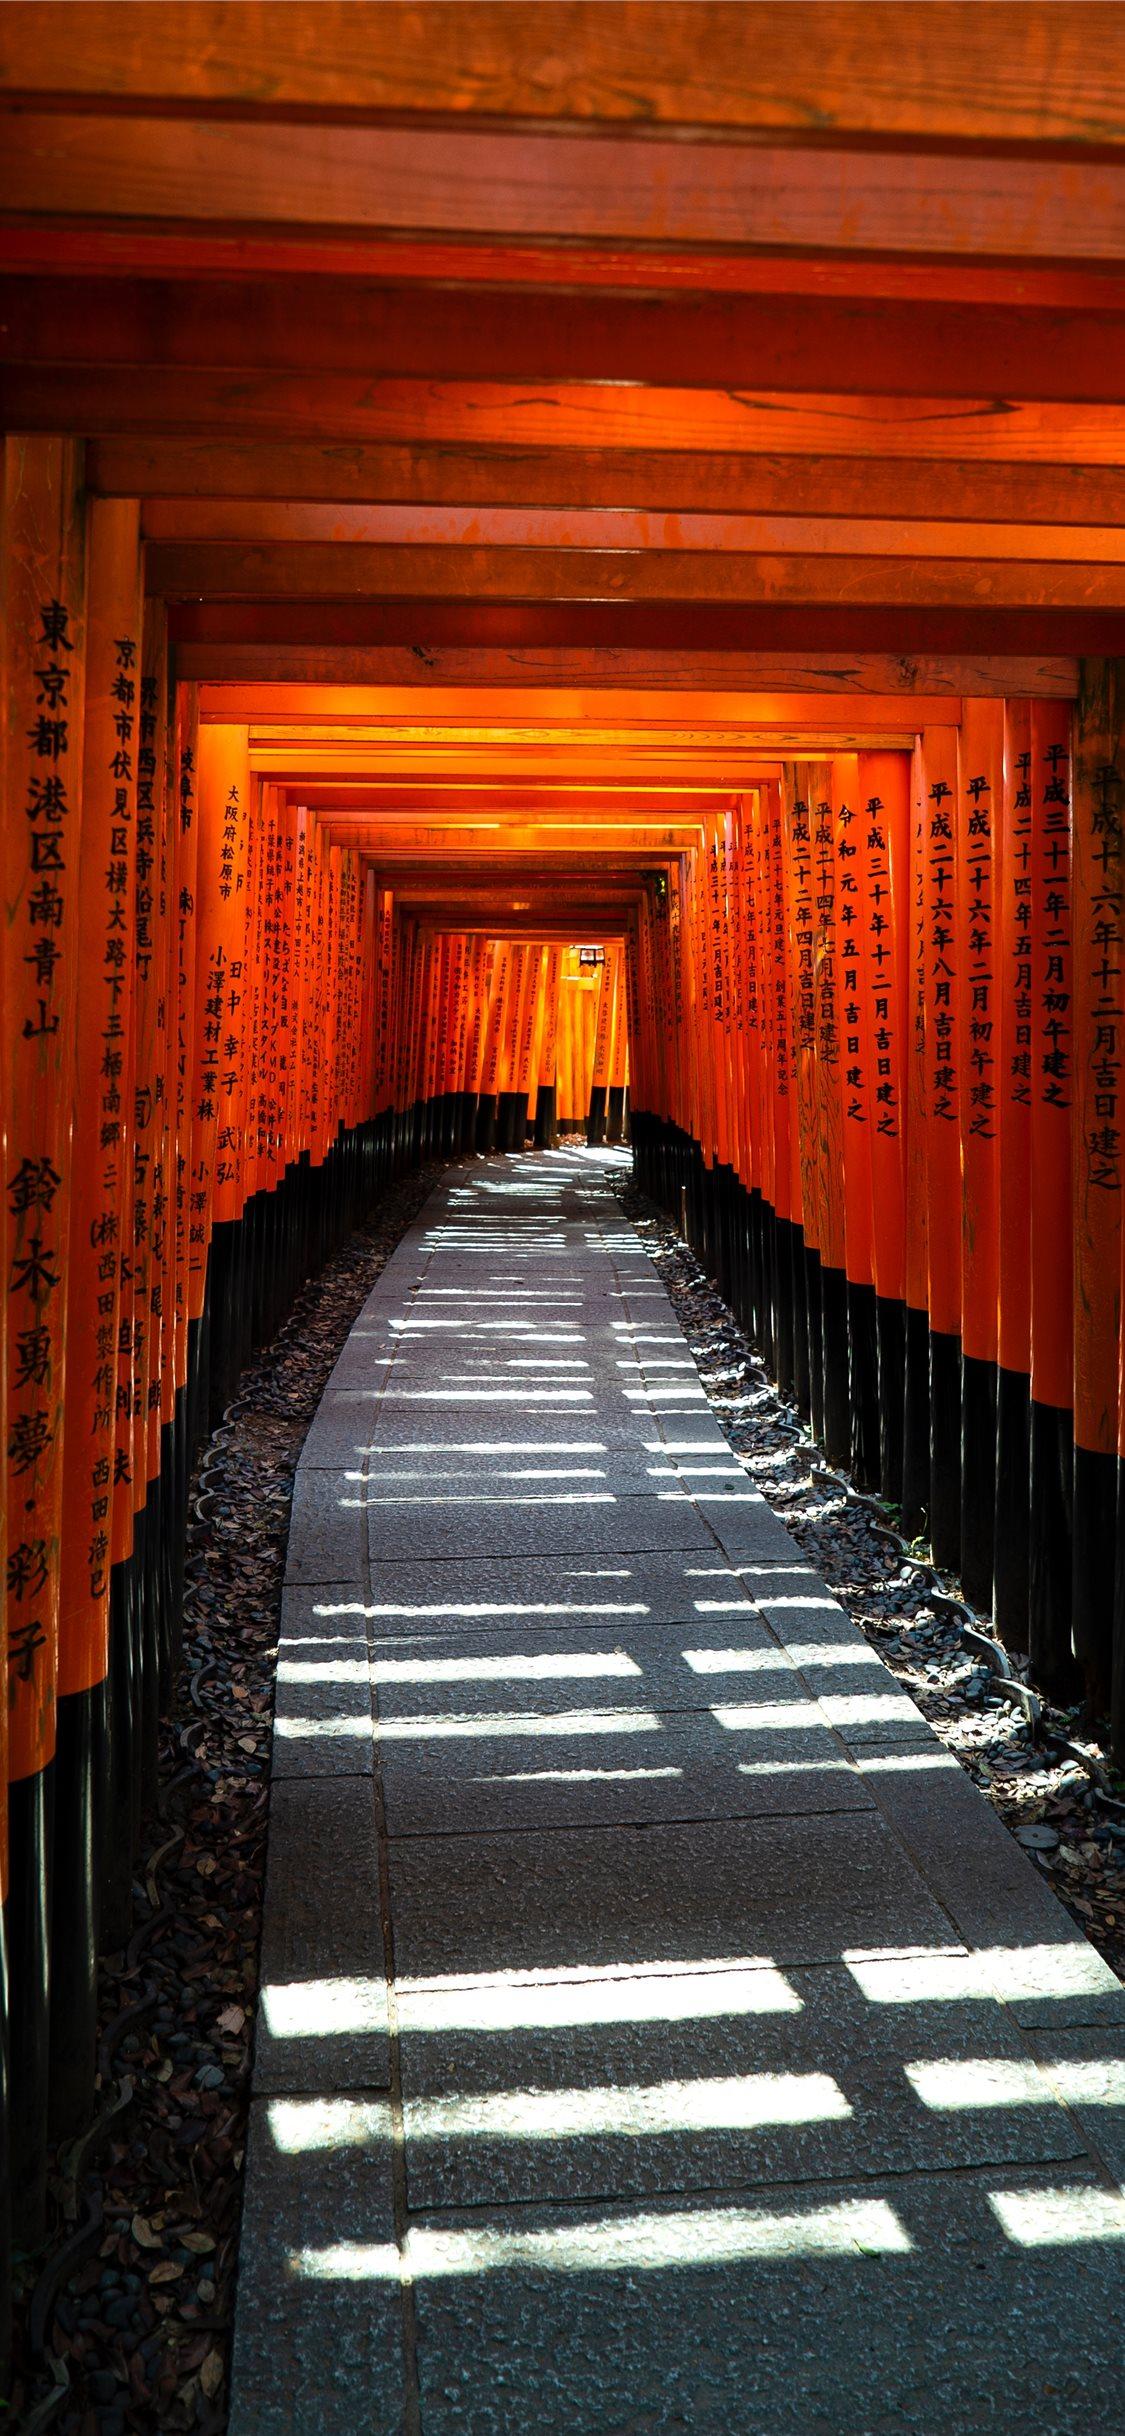 Fusihimi Inari Kyoto Japan Iphone X Wallpapers Free Download